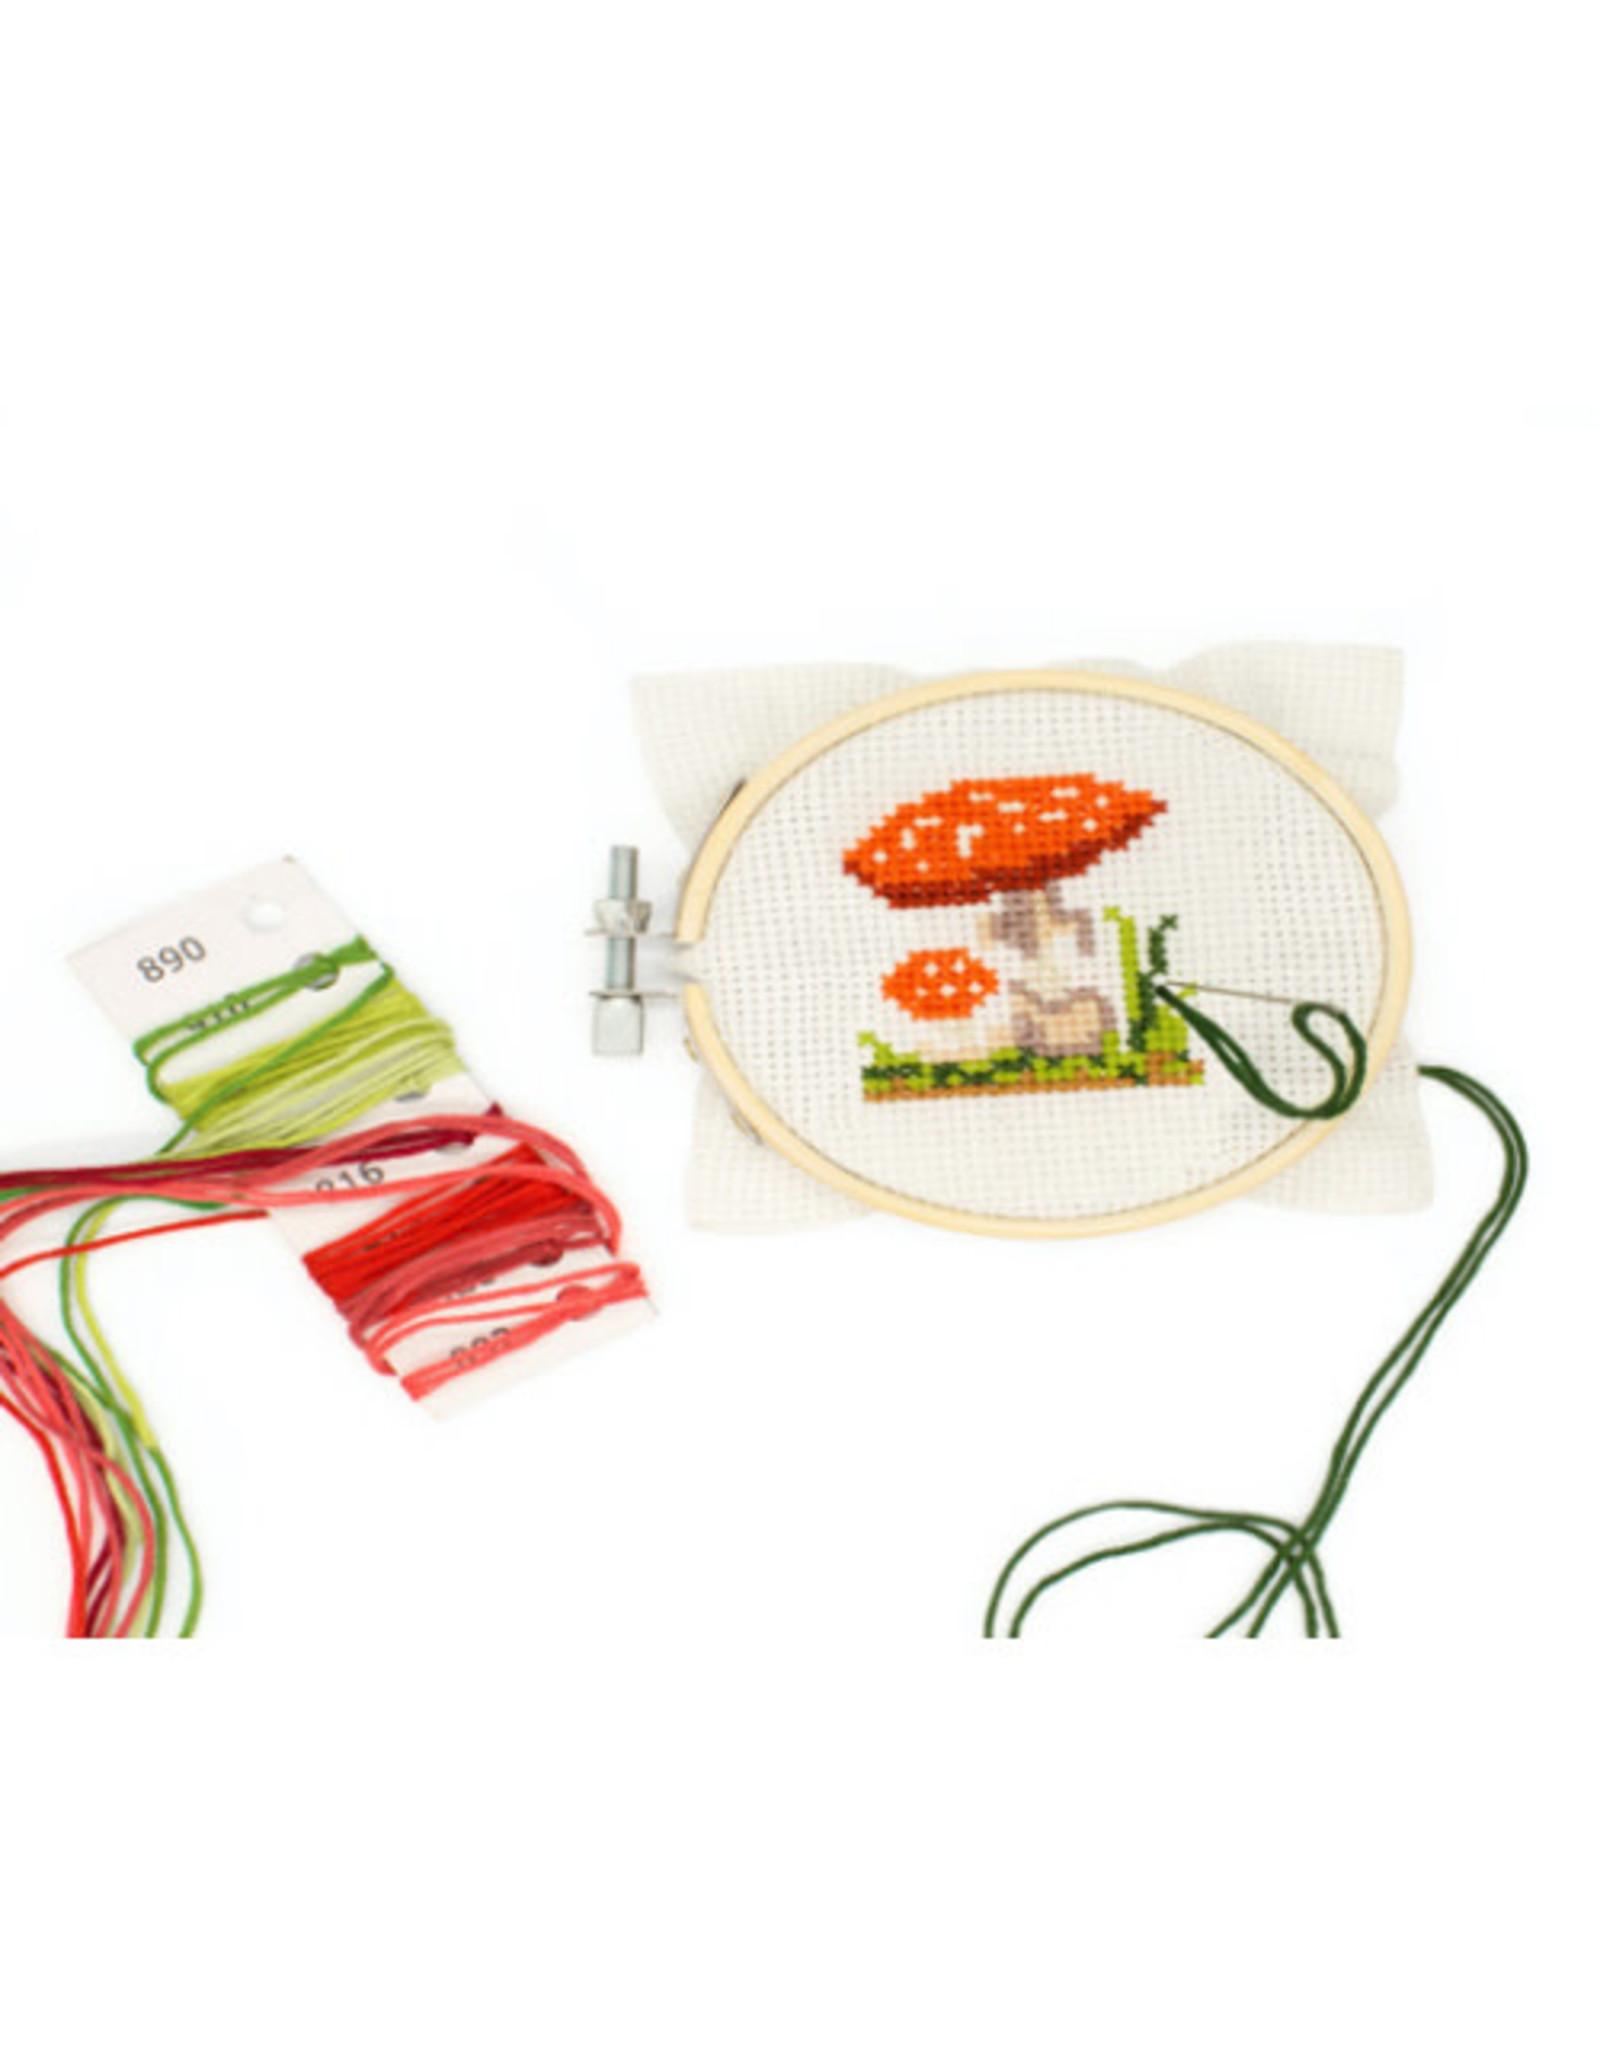 KND - Cross Stitch Embroidery Kit Mushroom